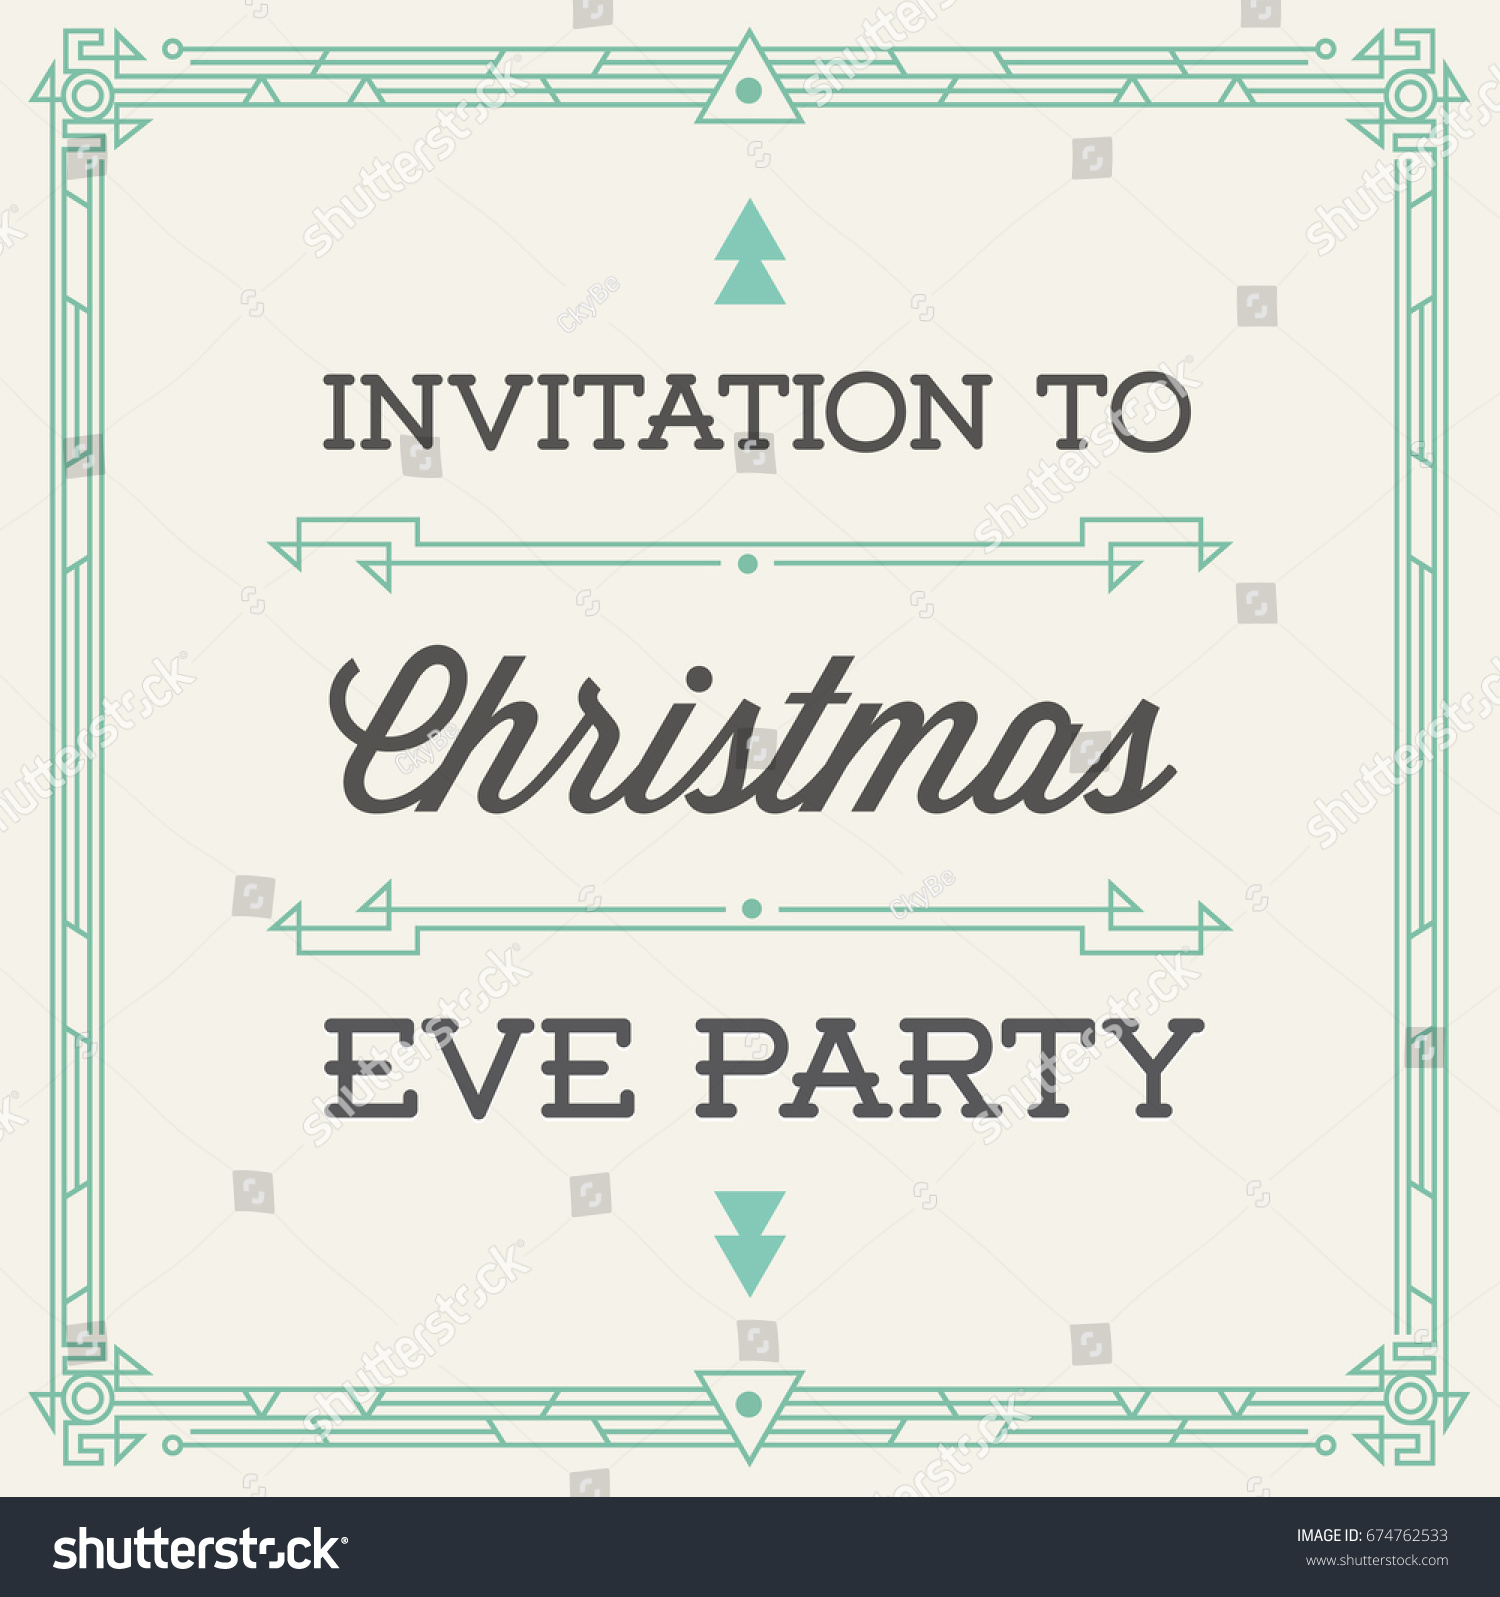 Vintage Style Invitation Wedding Save Day Stock Illustration ...